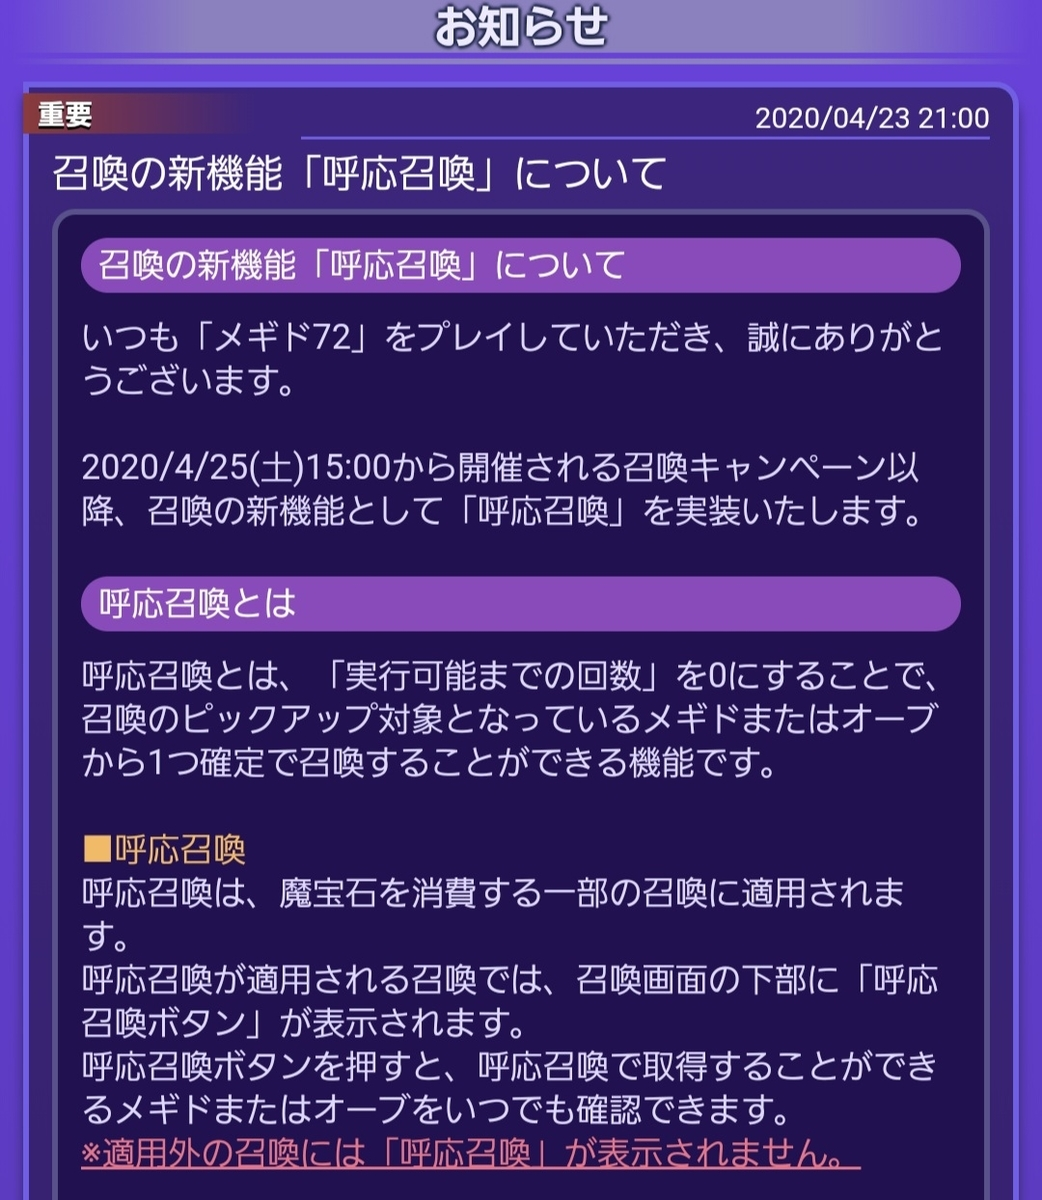 f:id:Nanaki-Nanashino:20210328184919j:plain